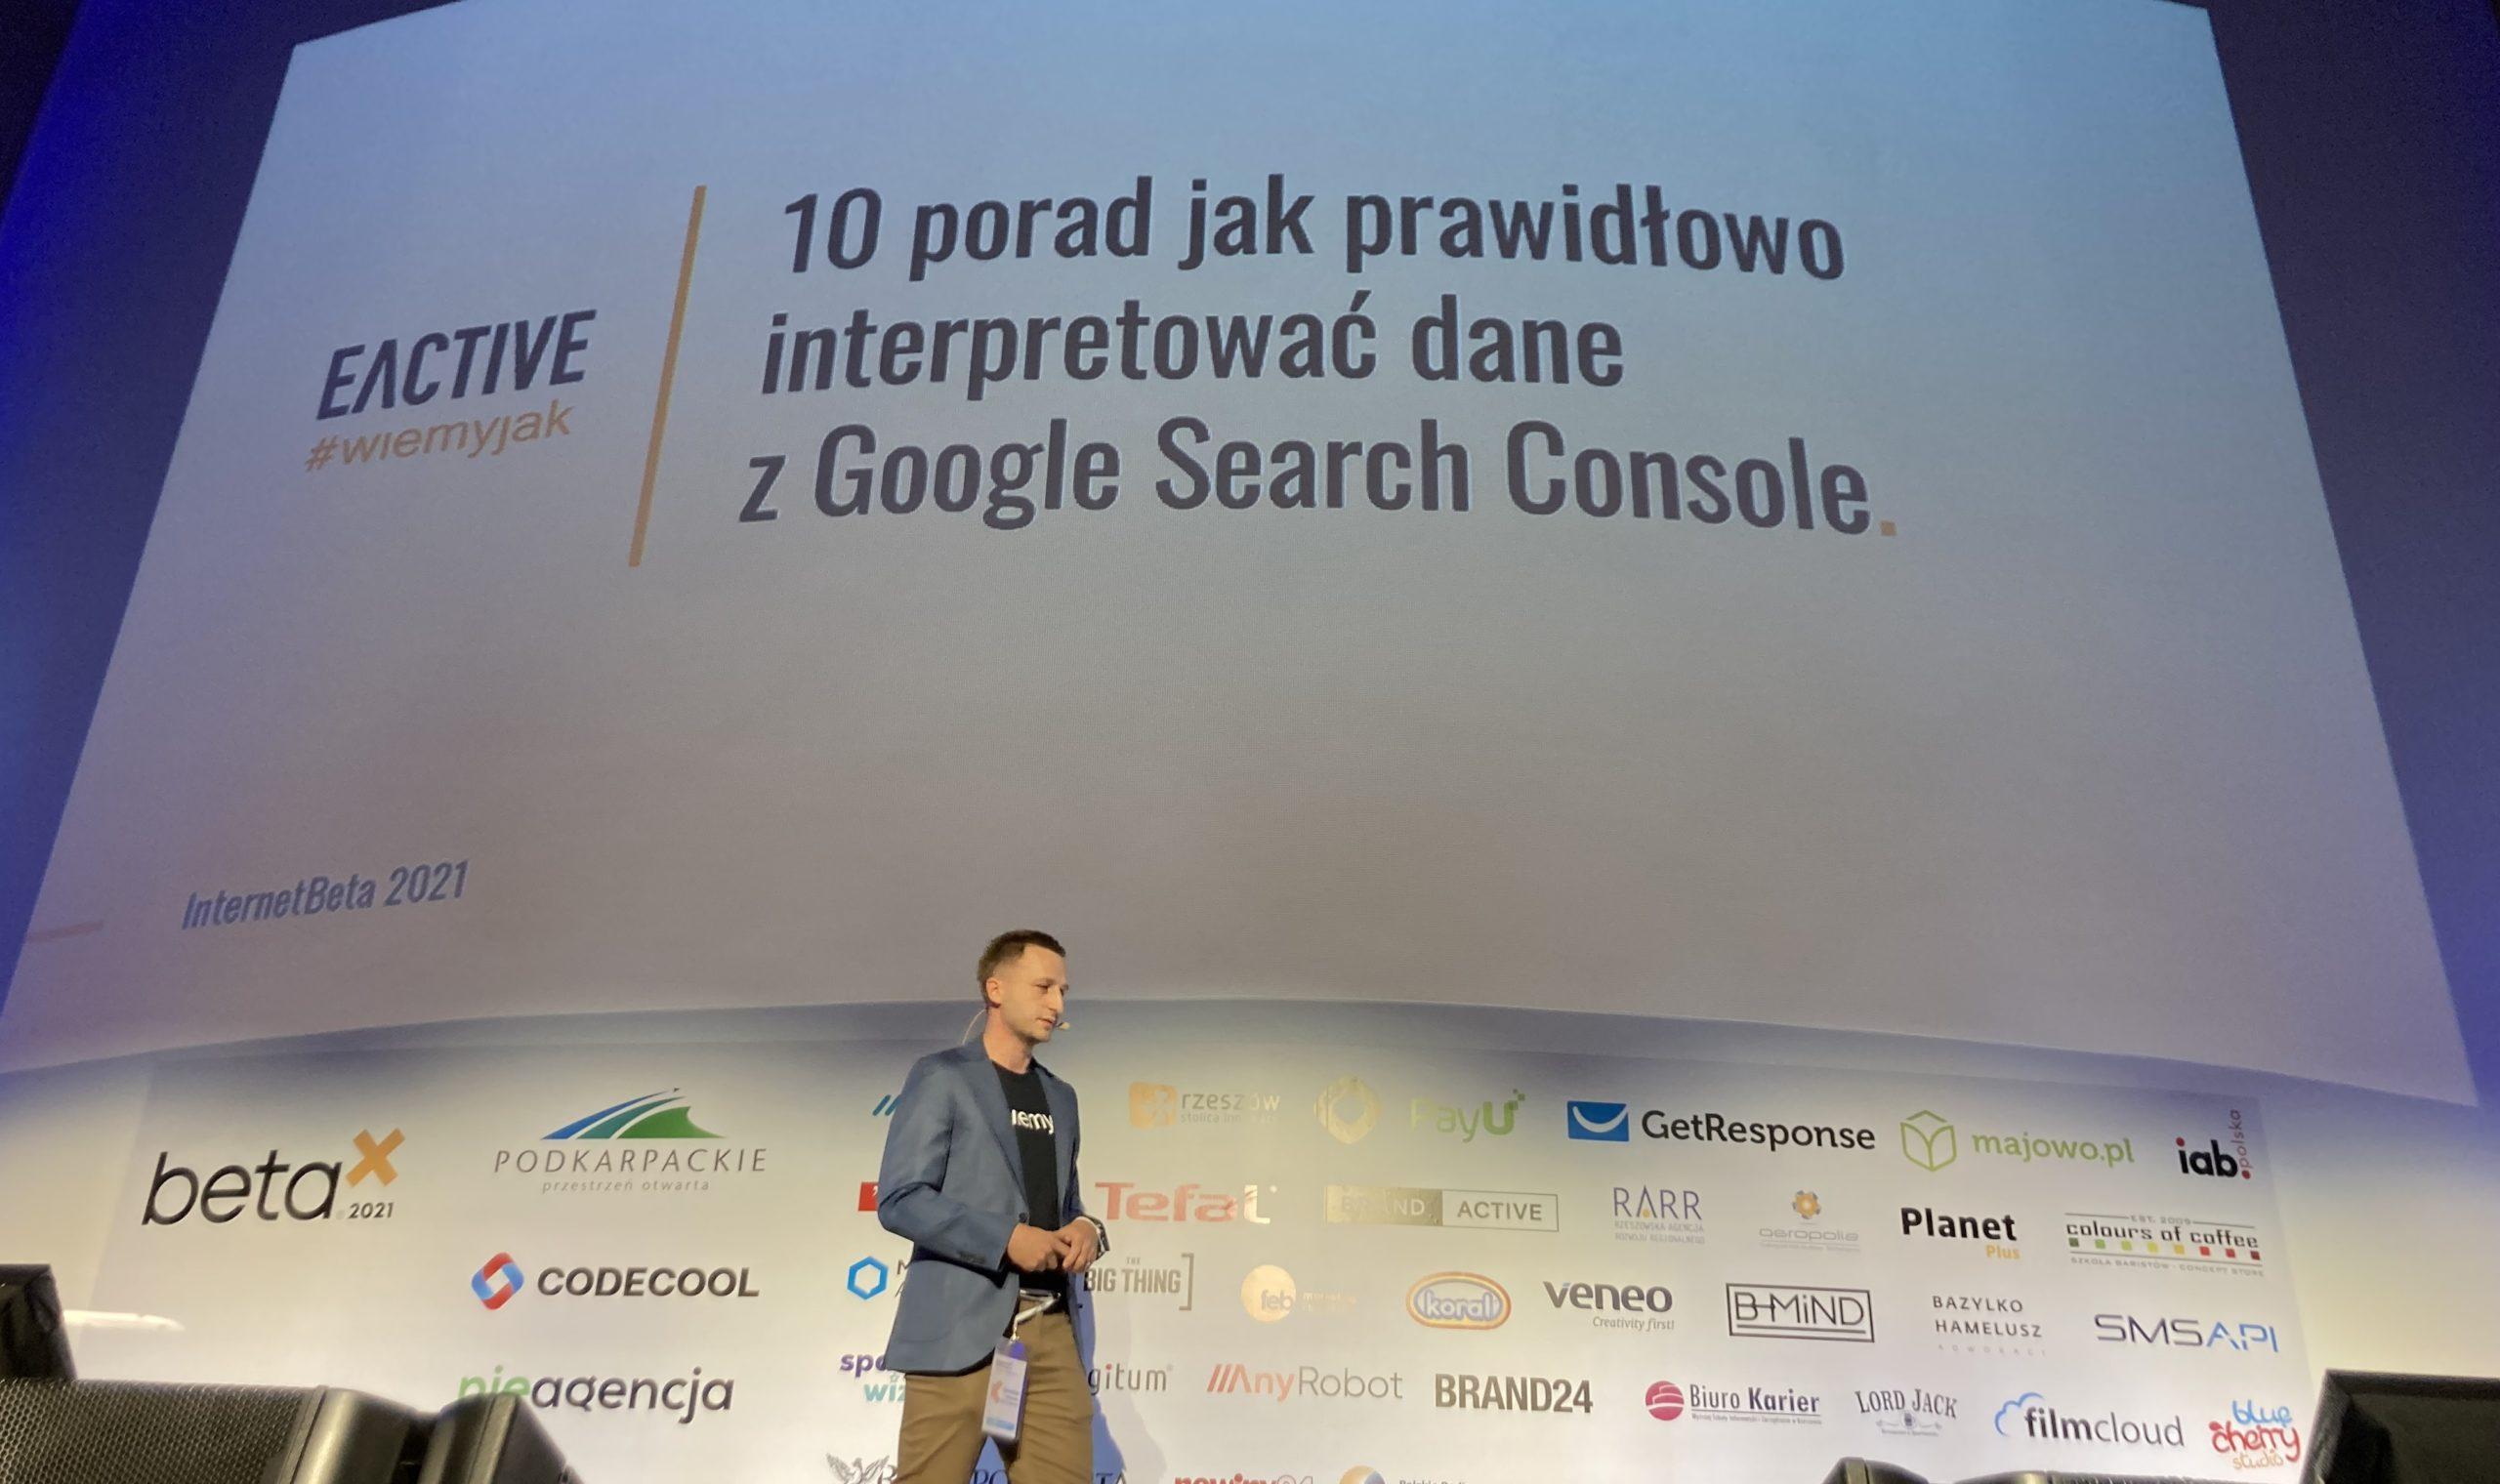 Eactive na Konferencji InternetBeta 2021